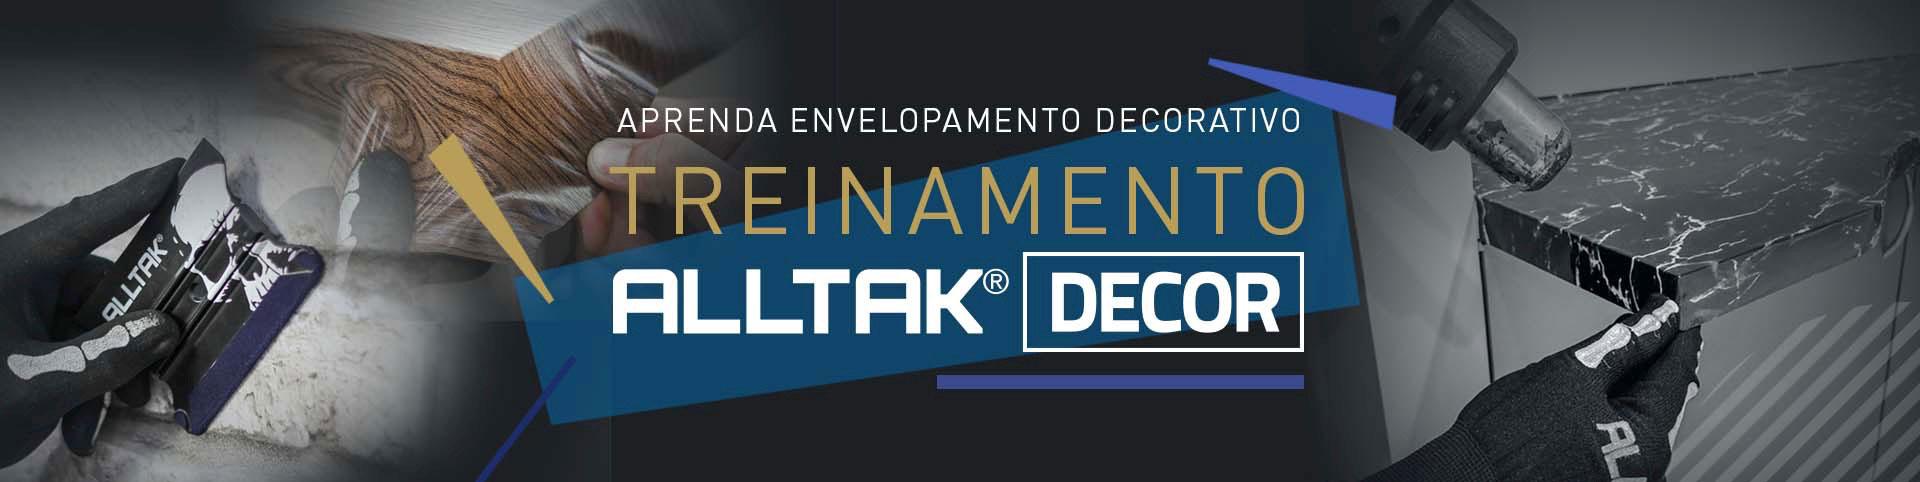 Aprenda Envelopamento Decorativo - Alltak Decor